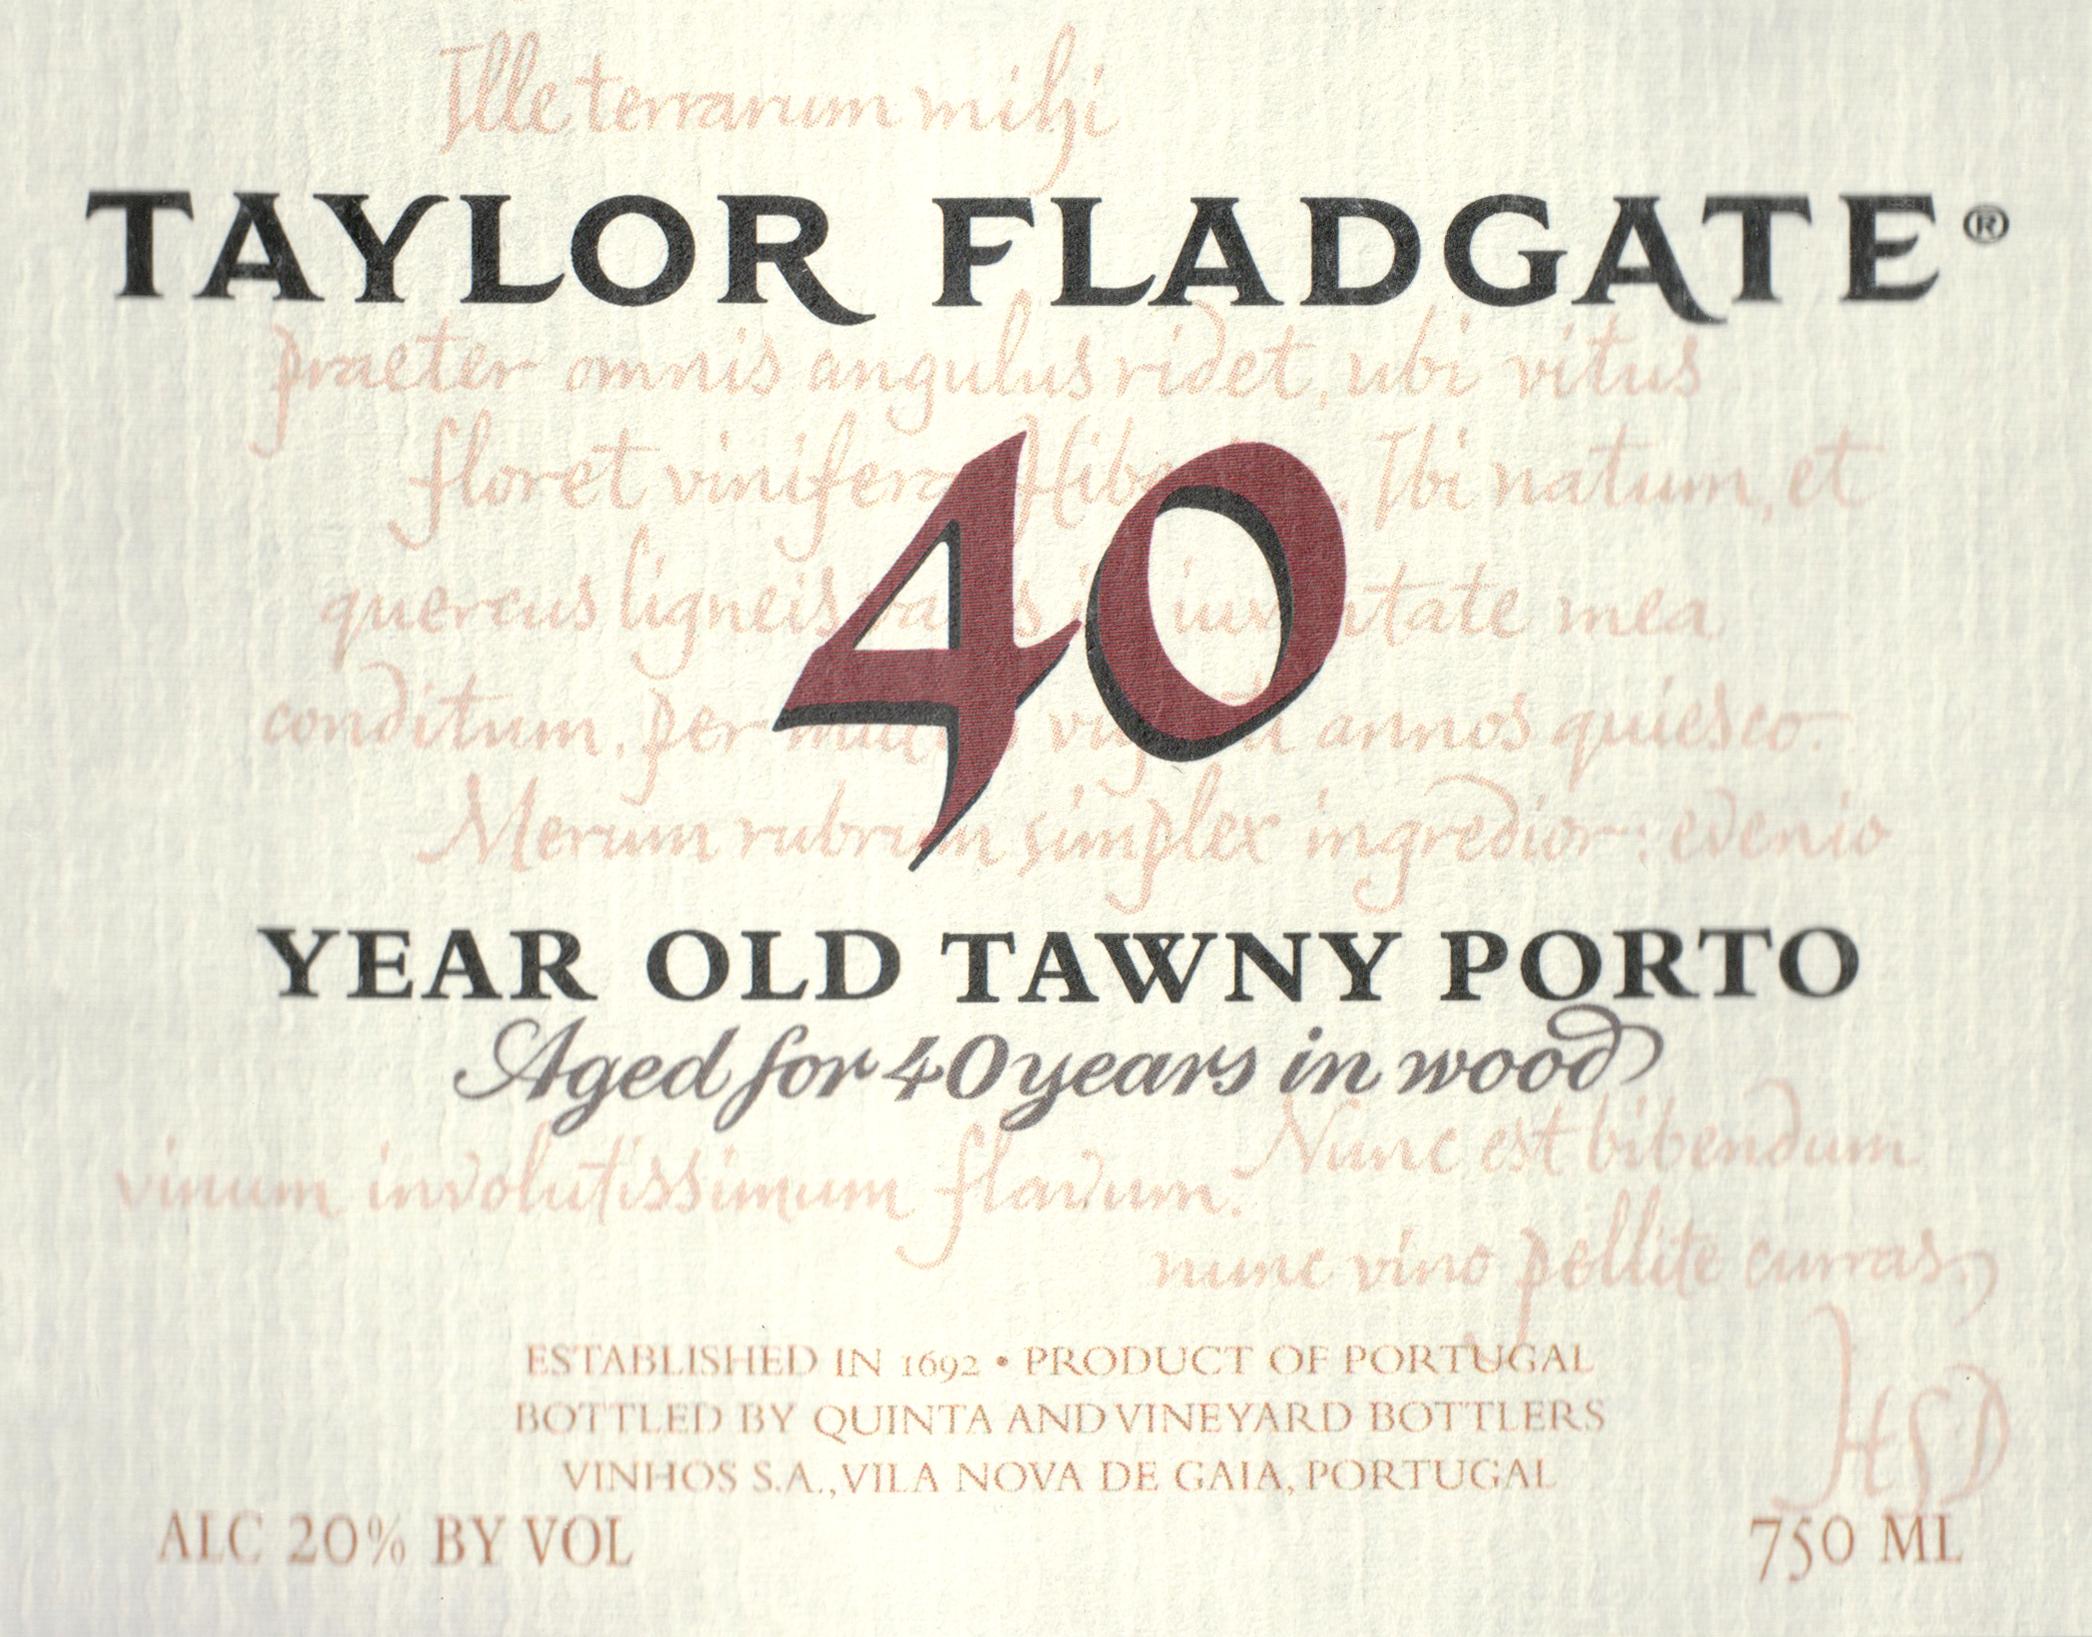 Taylor Fladgate 40 Year Tawny Port